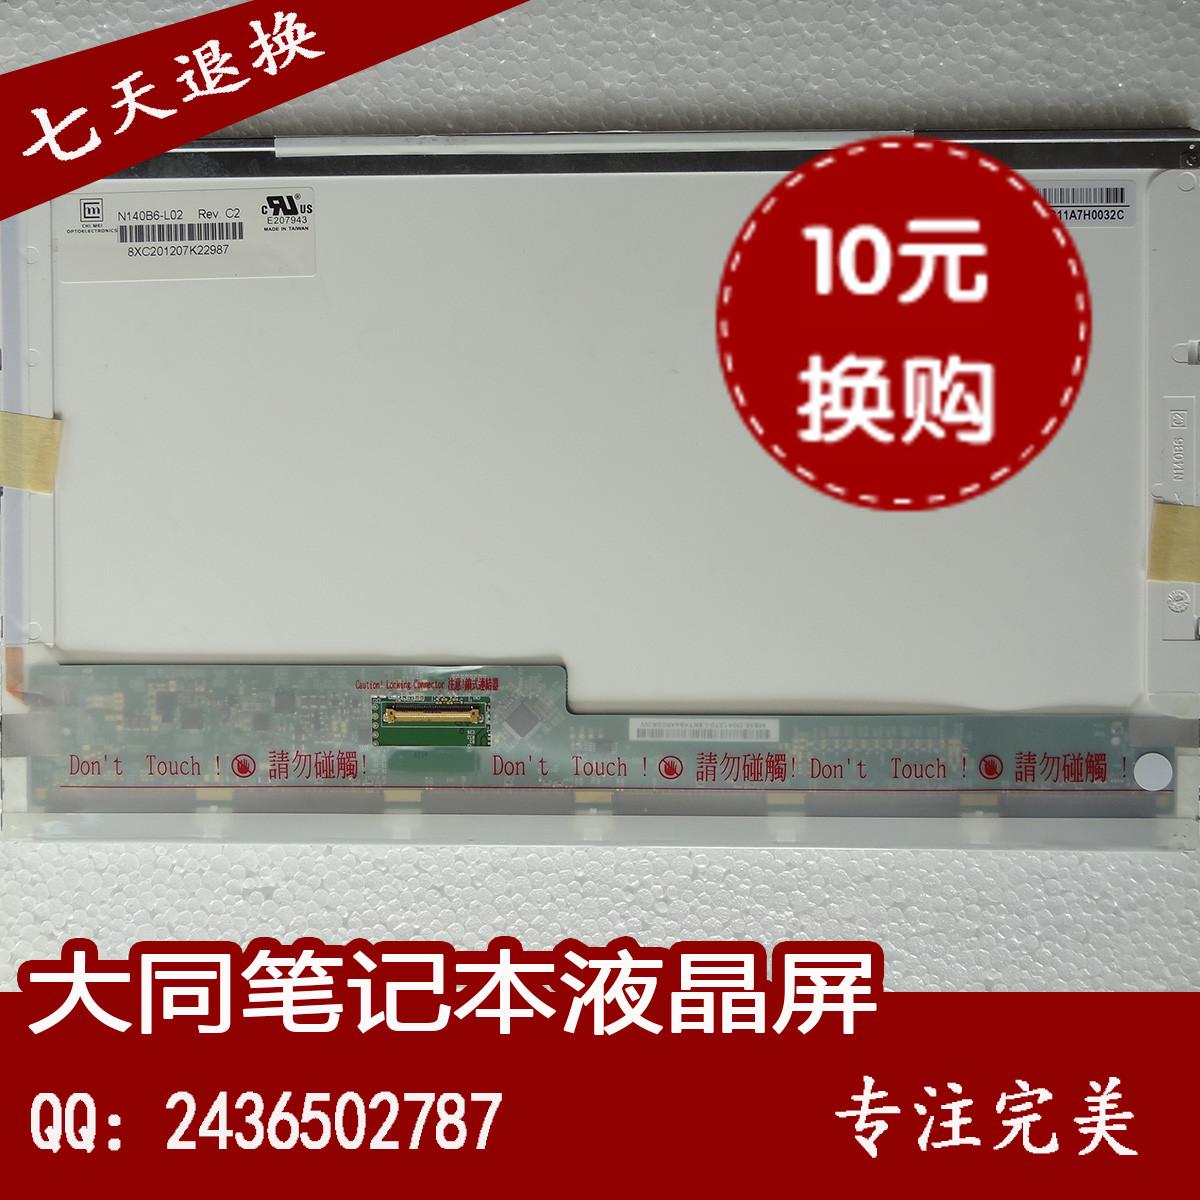 Комплектующие и запчасти для ноутбуков N4020 M4040 N4030 N4050 N4110 M4010 Жидкокристаллический дисплей